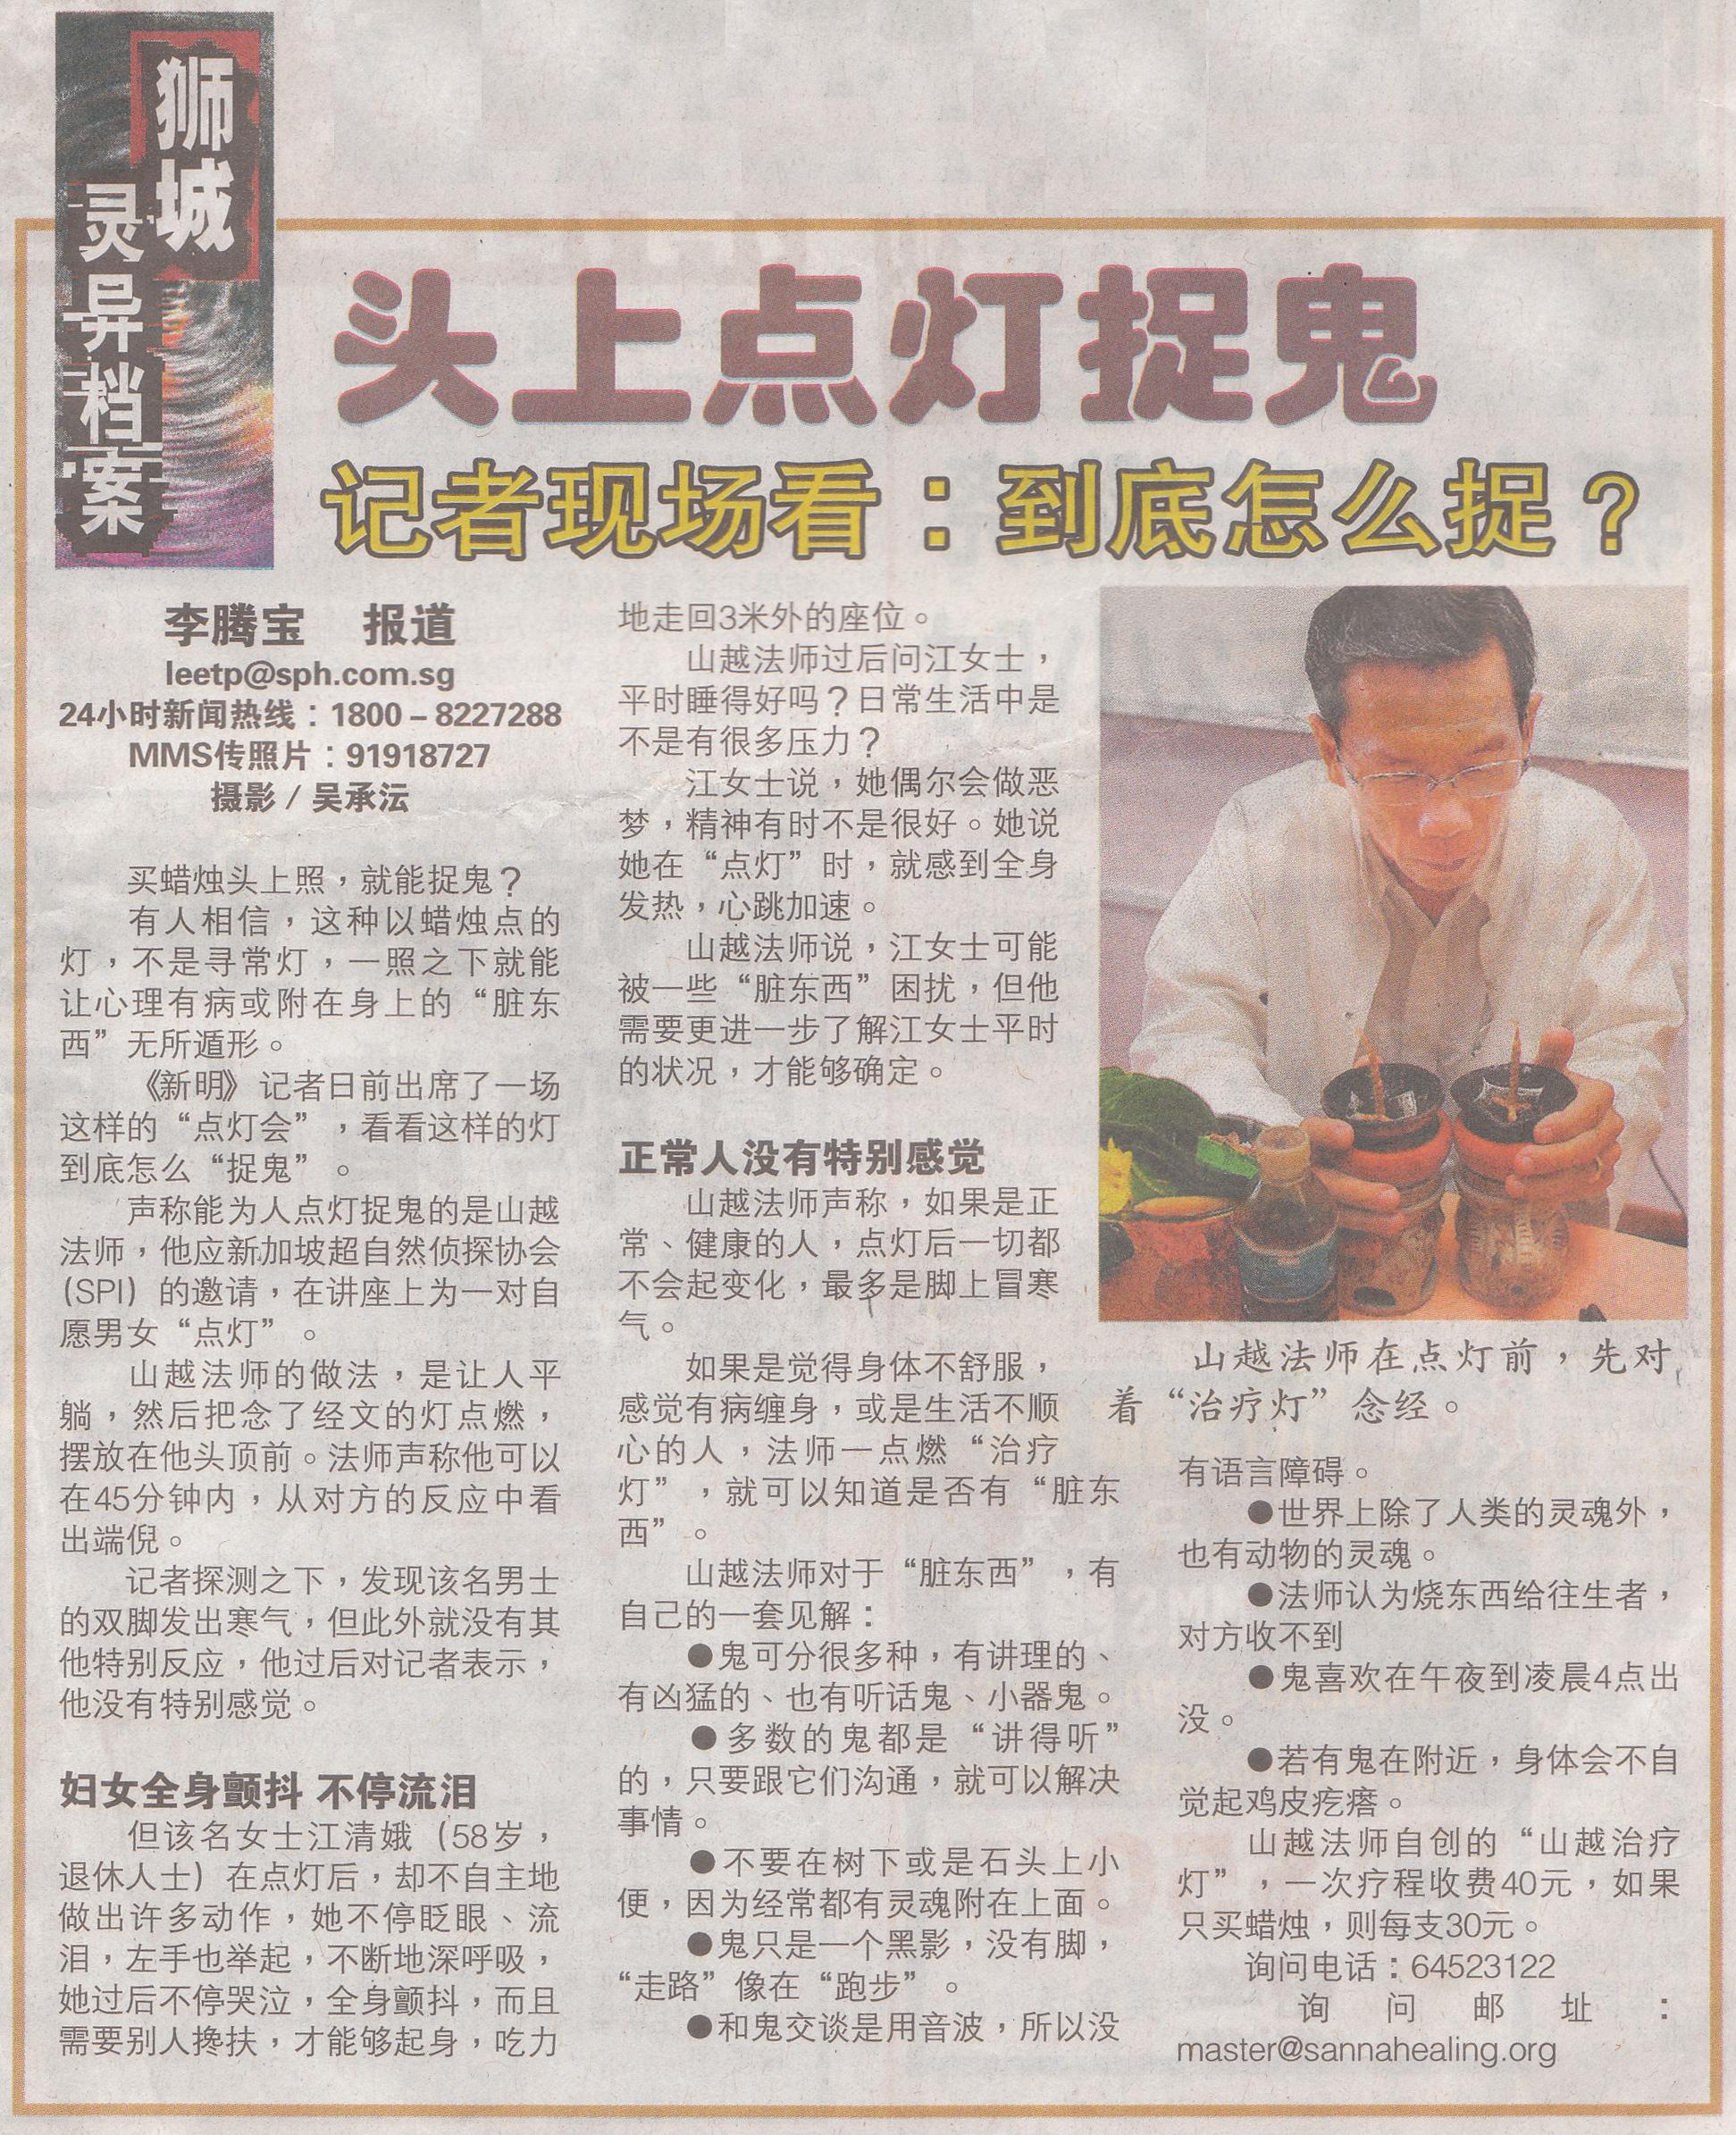 Shin Min Daily News Singapore Coverage of Sanna Healing Lamp